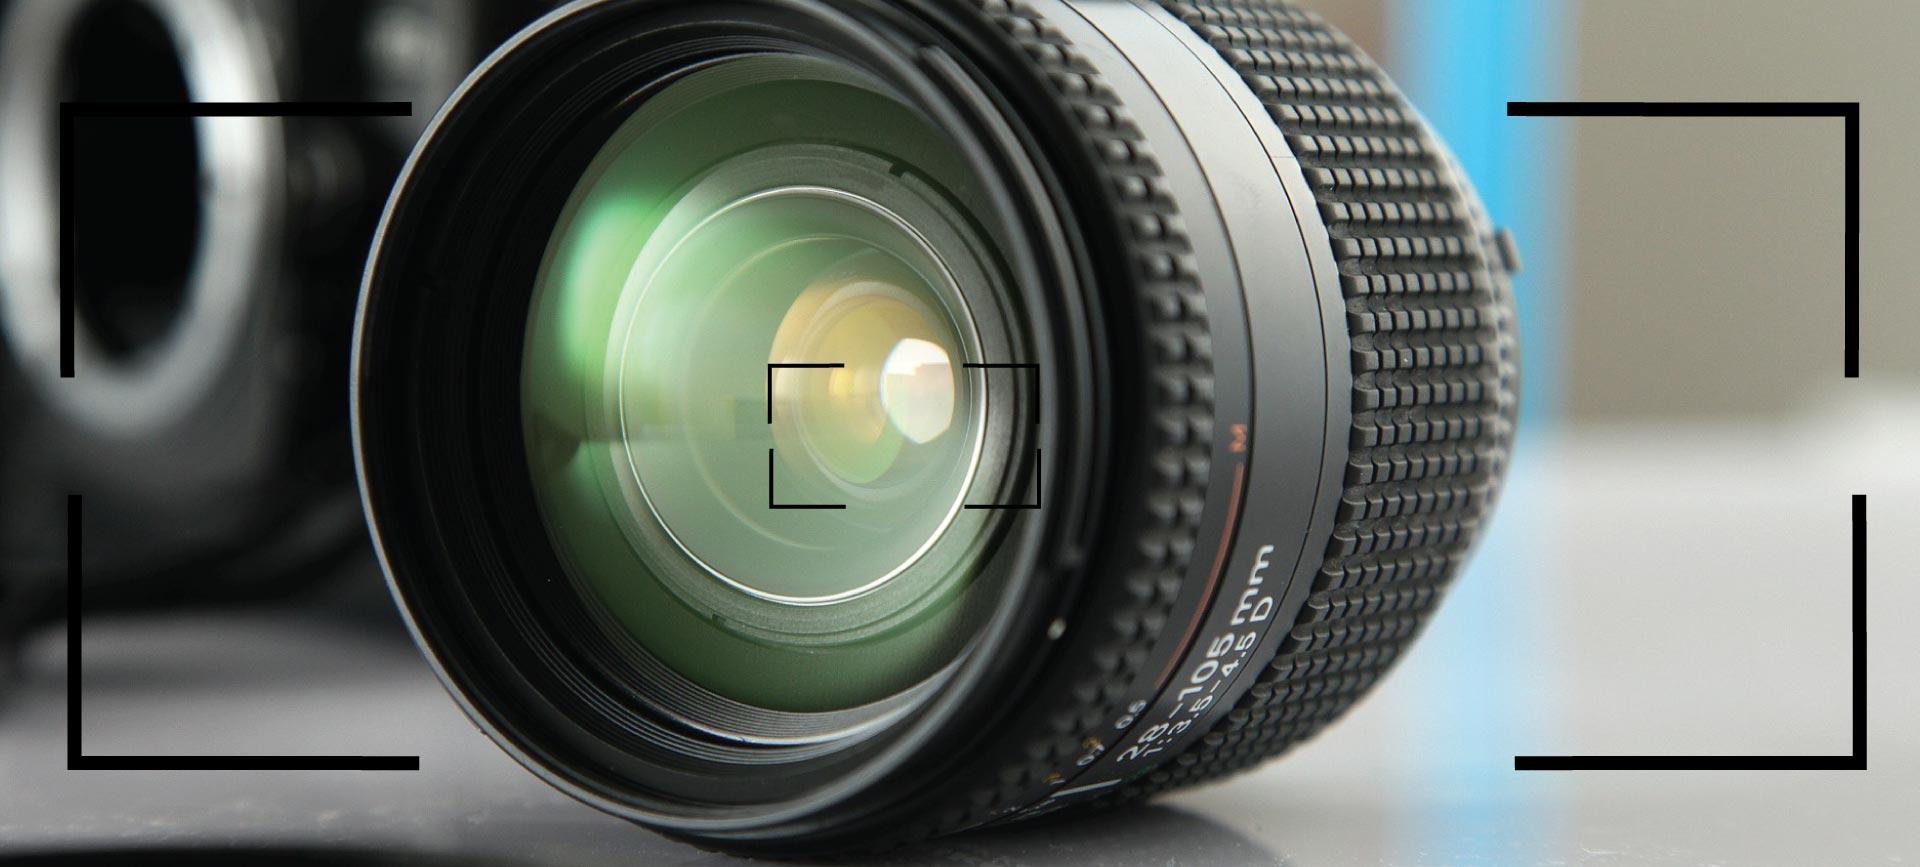 Composition in Photography - عناصر ترکیب بندی در عکاسی